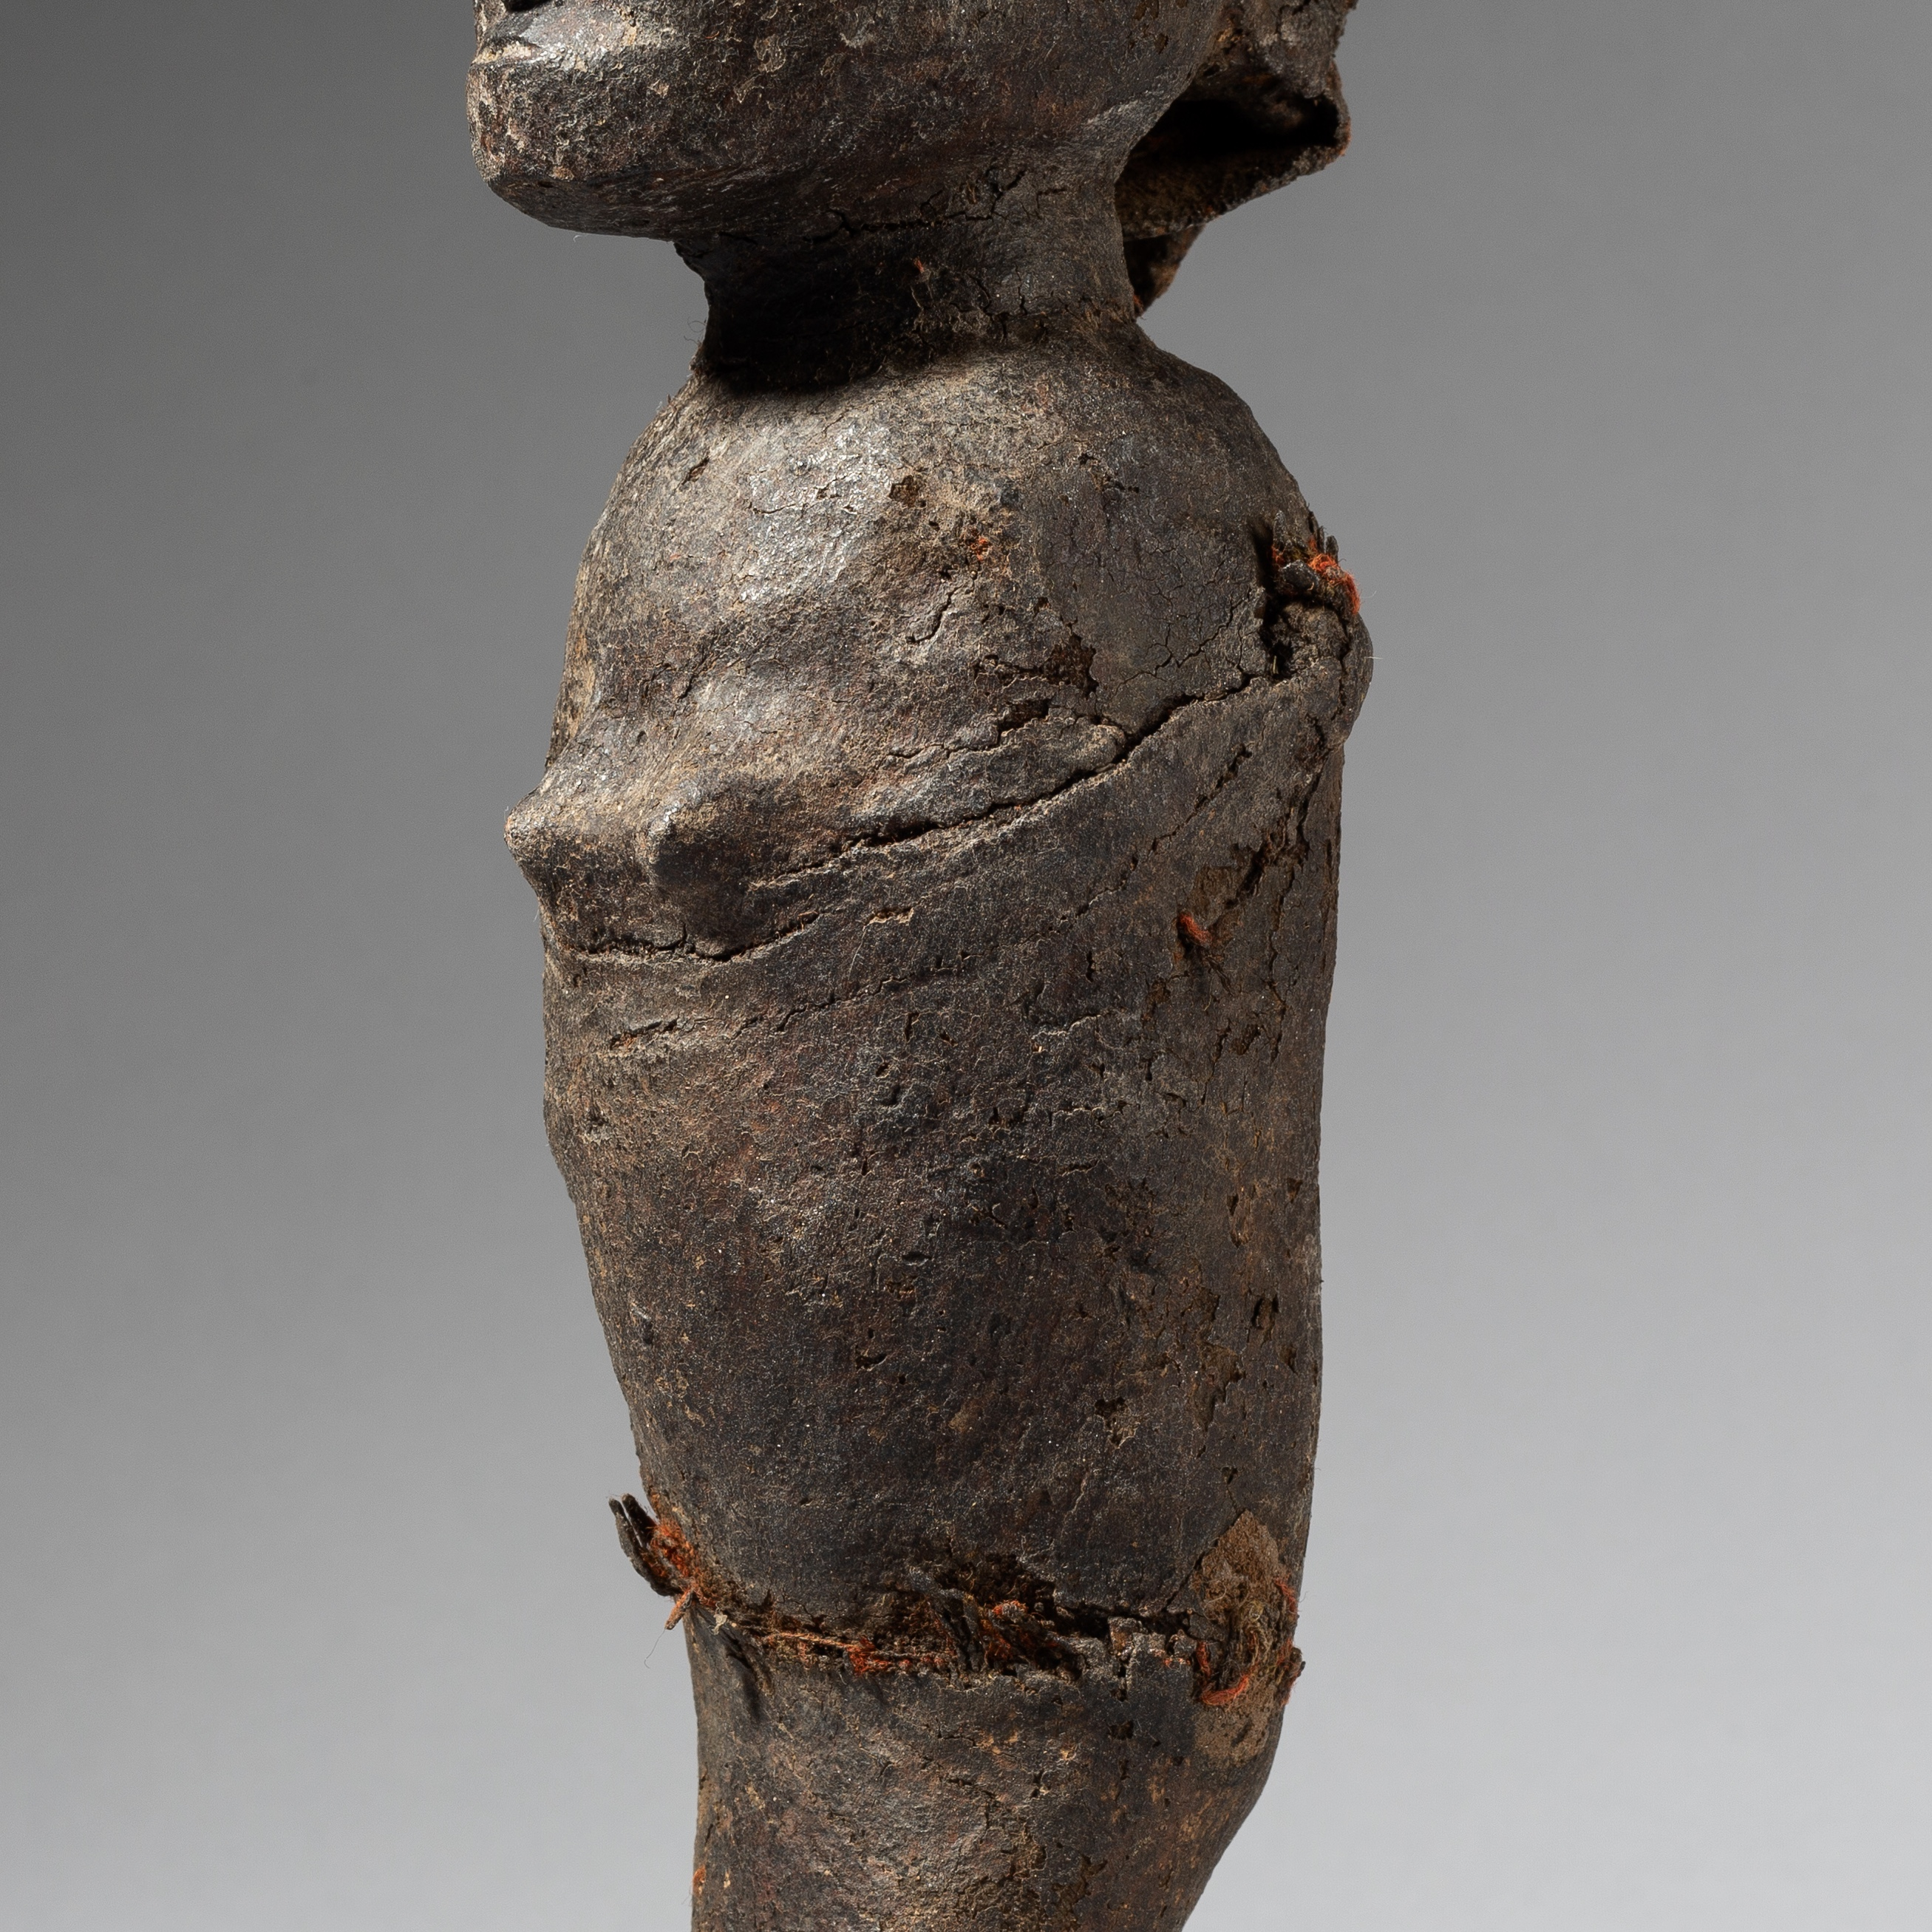 A BOUND AND ENCRUSTED NYAMWEZI TRIBE STATUE FROM TANZANIA (No 3622)